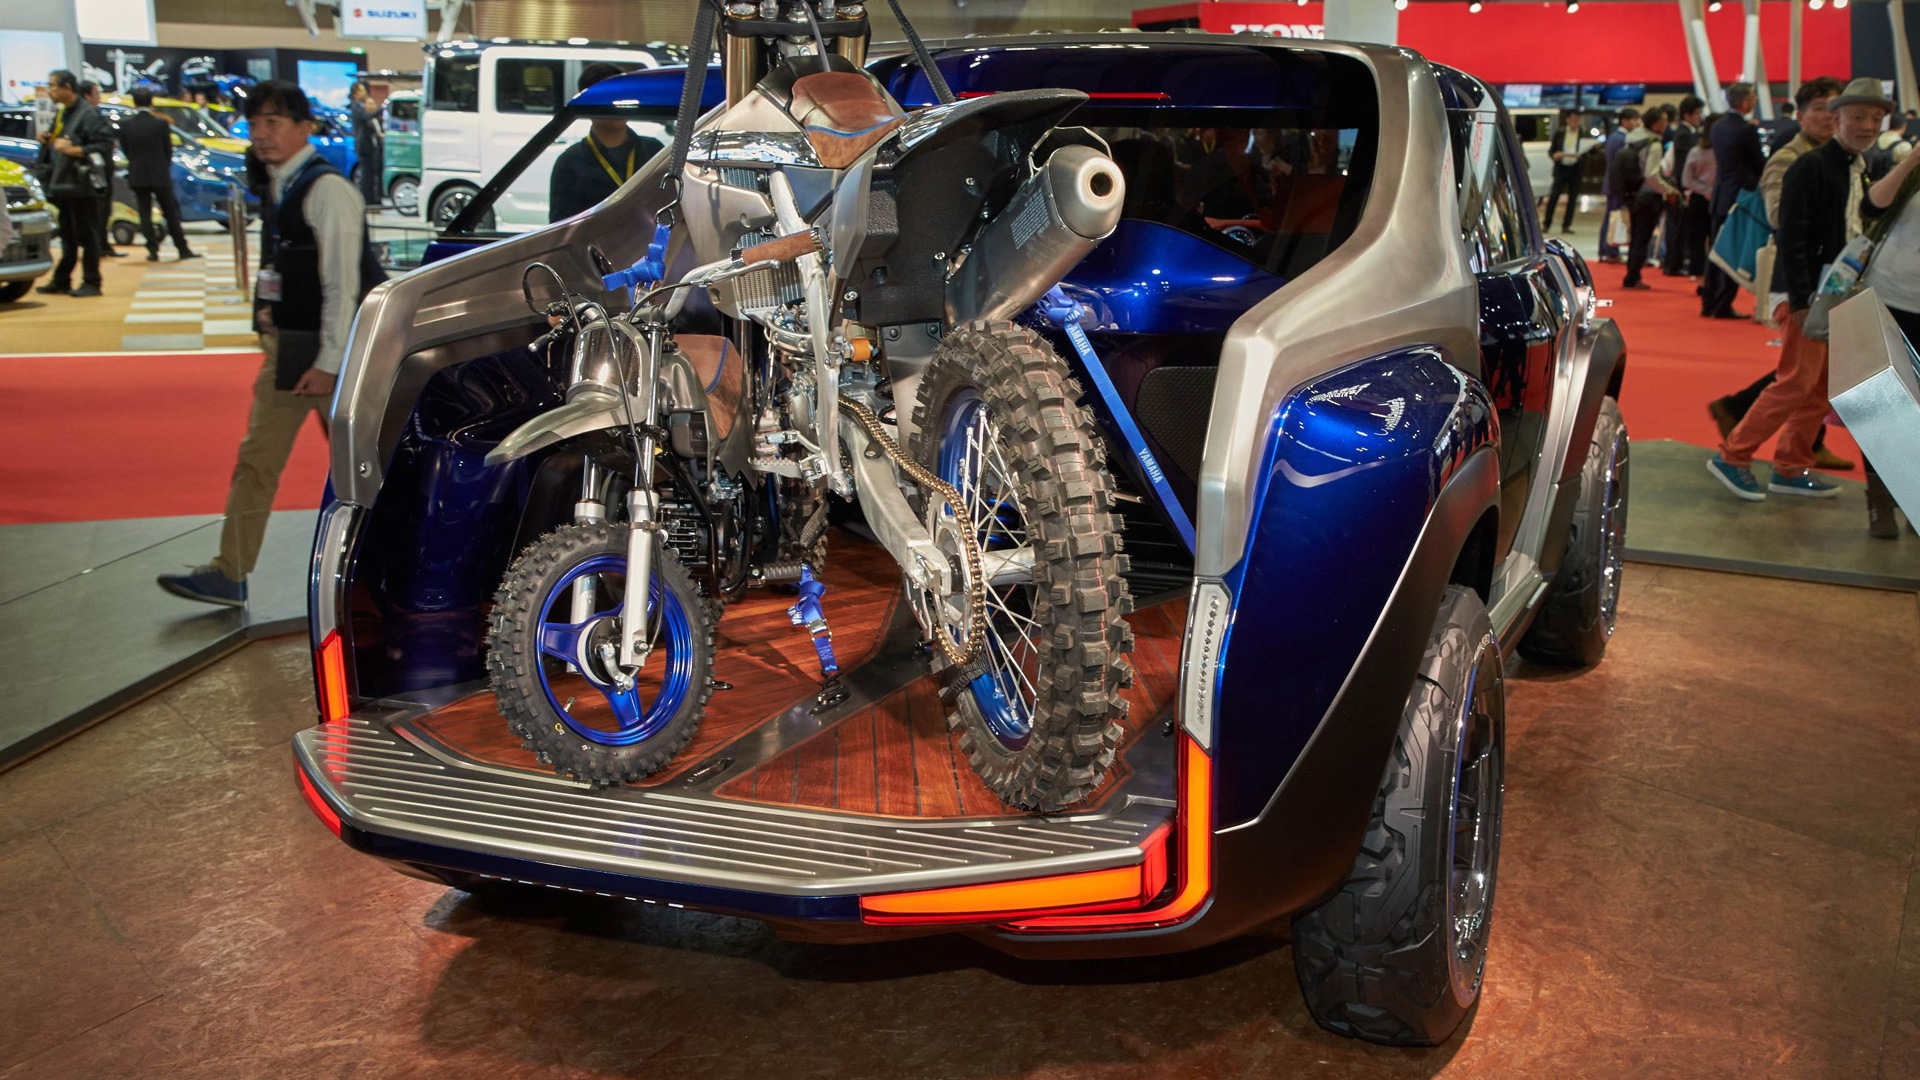 Yamaha Cross Hub concept, 2017 Tokyo Motor Show